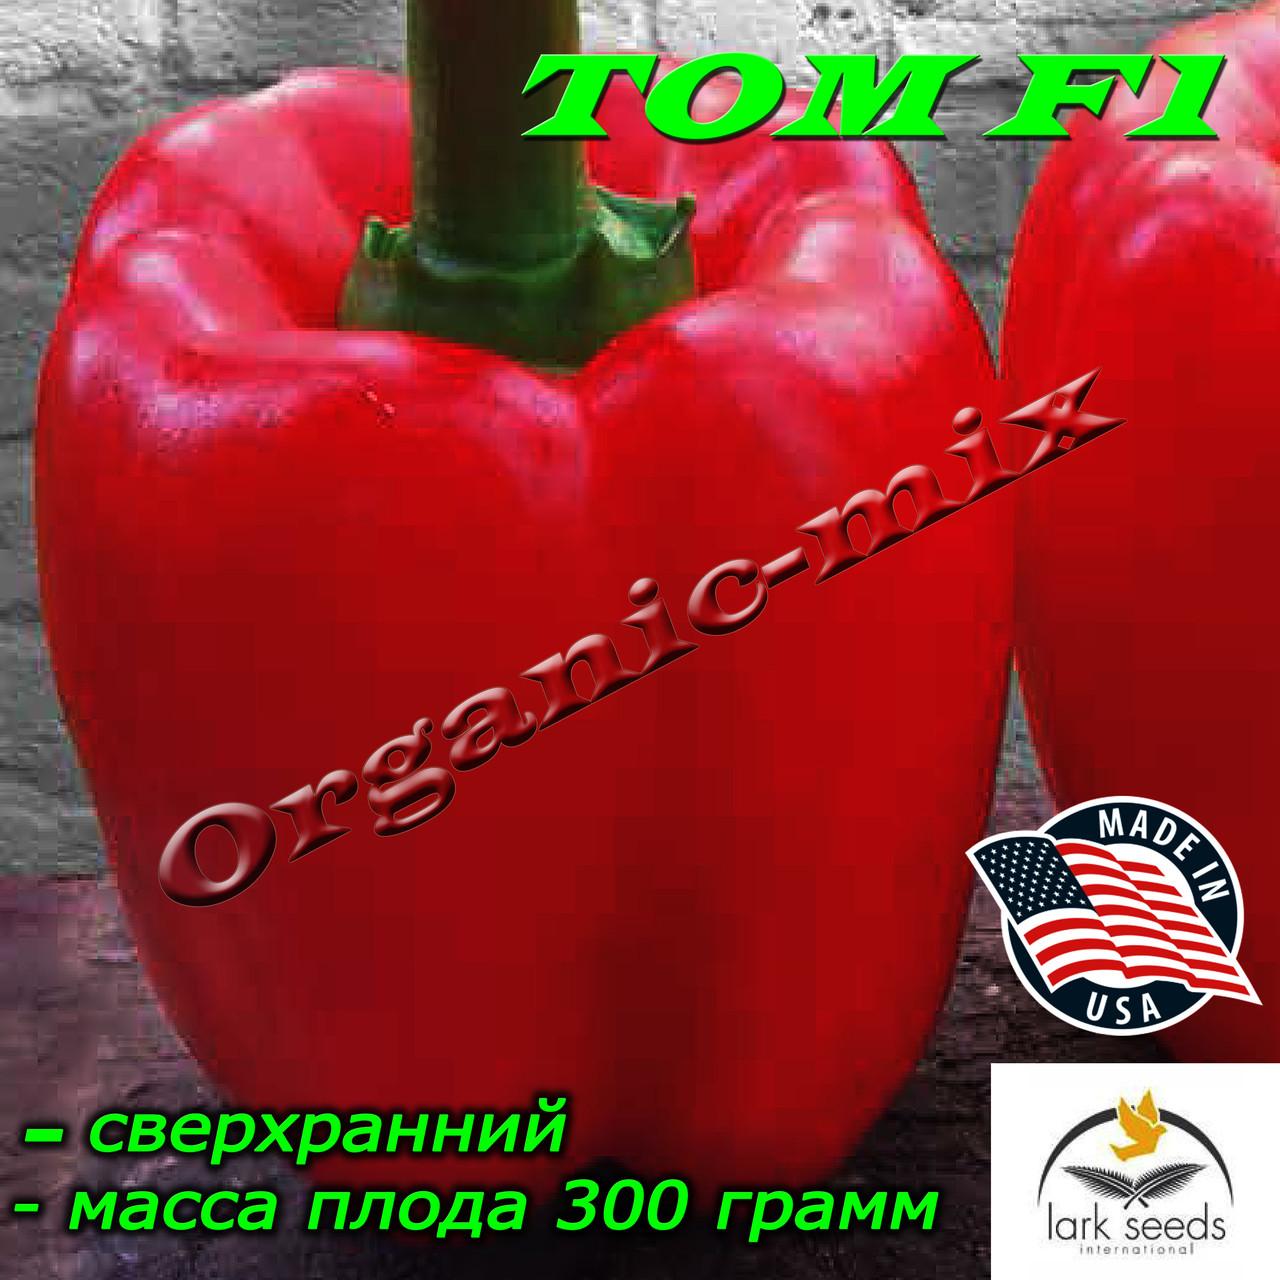 ТОМ F1 / ТОМ F1, семена красного, раннего кубовидного перца, пакет 500 семян ТМ Lark Seeds (США)